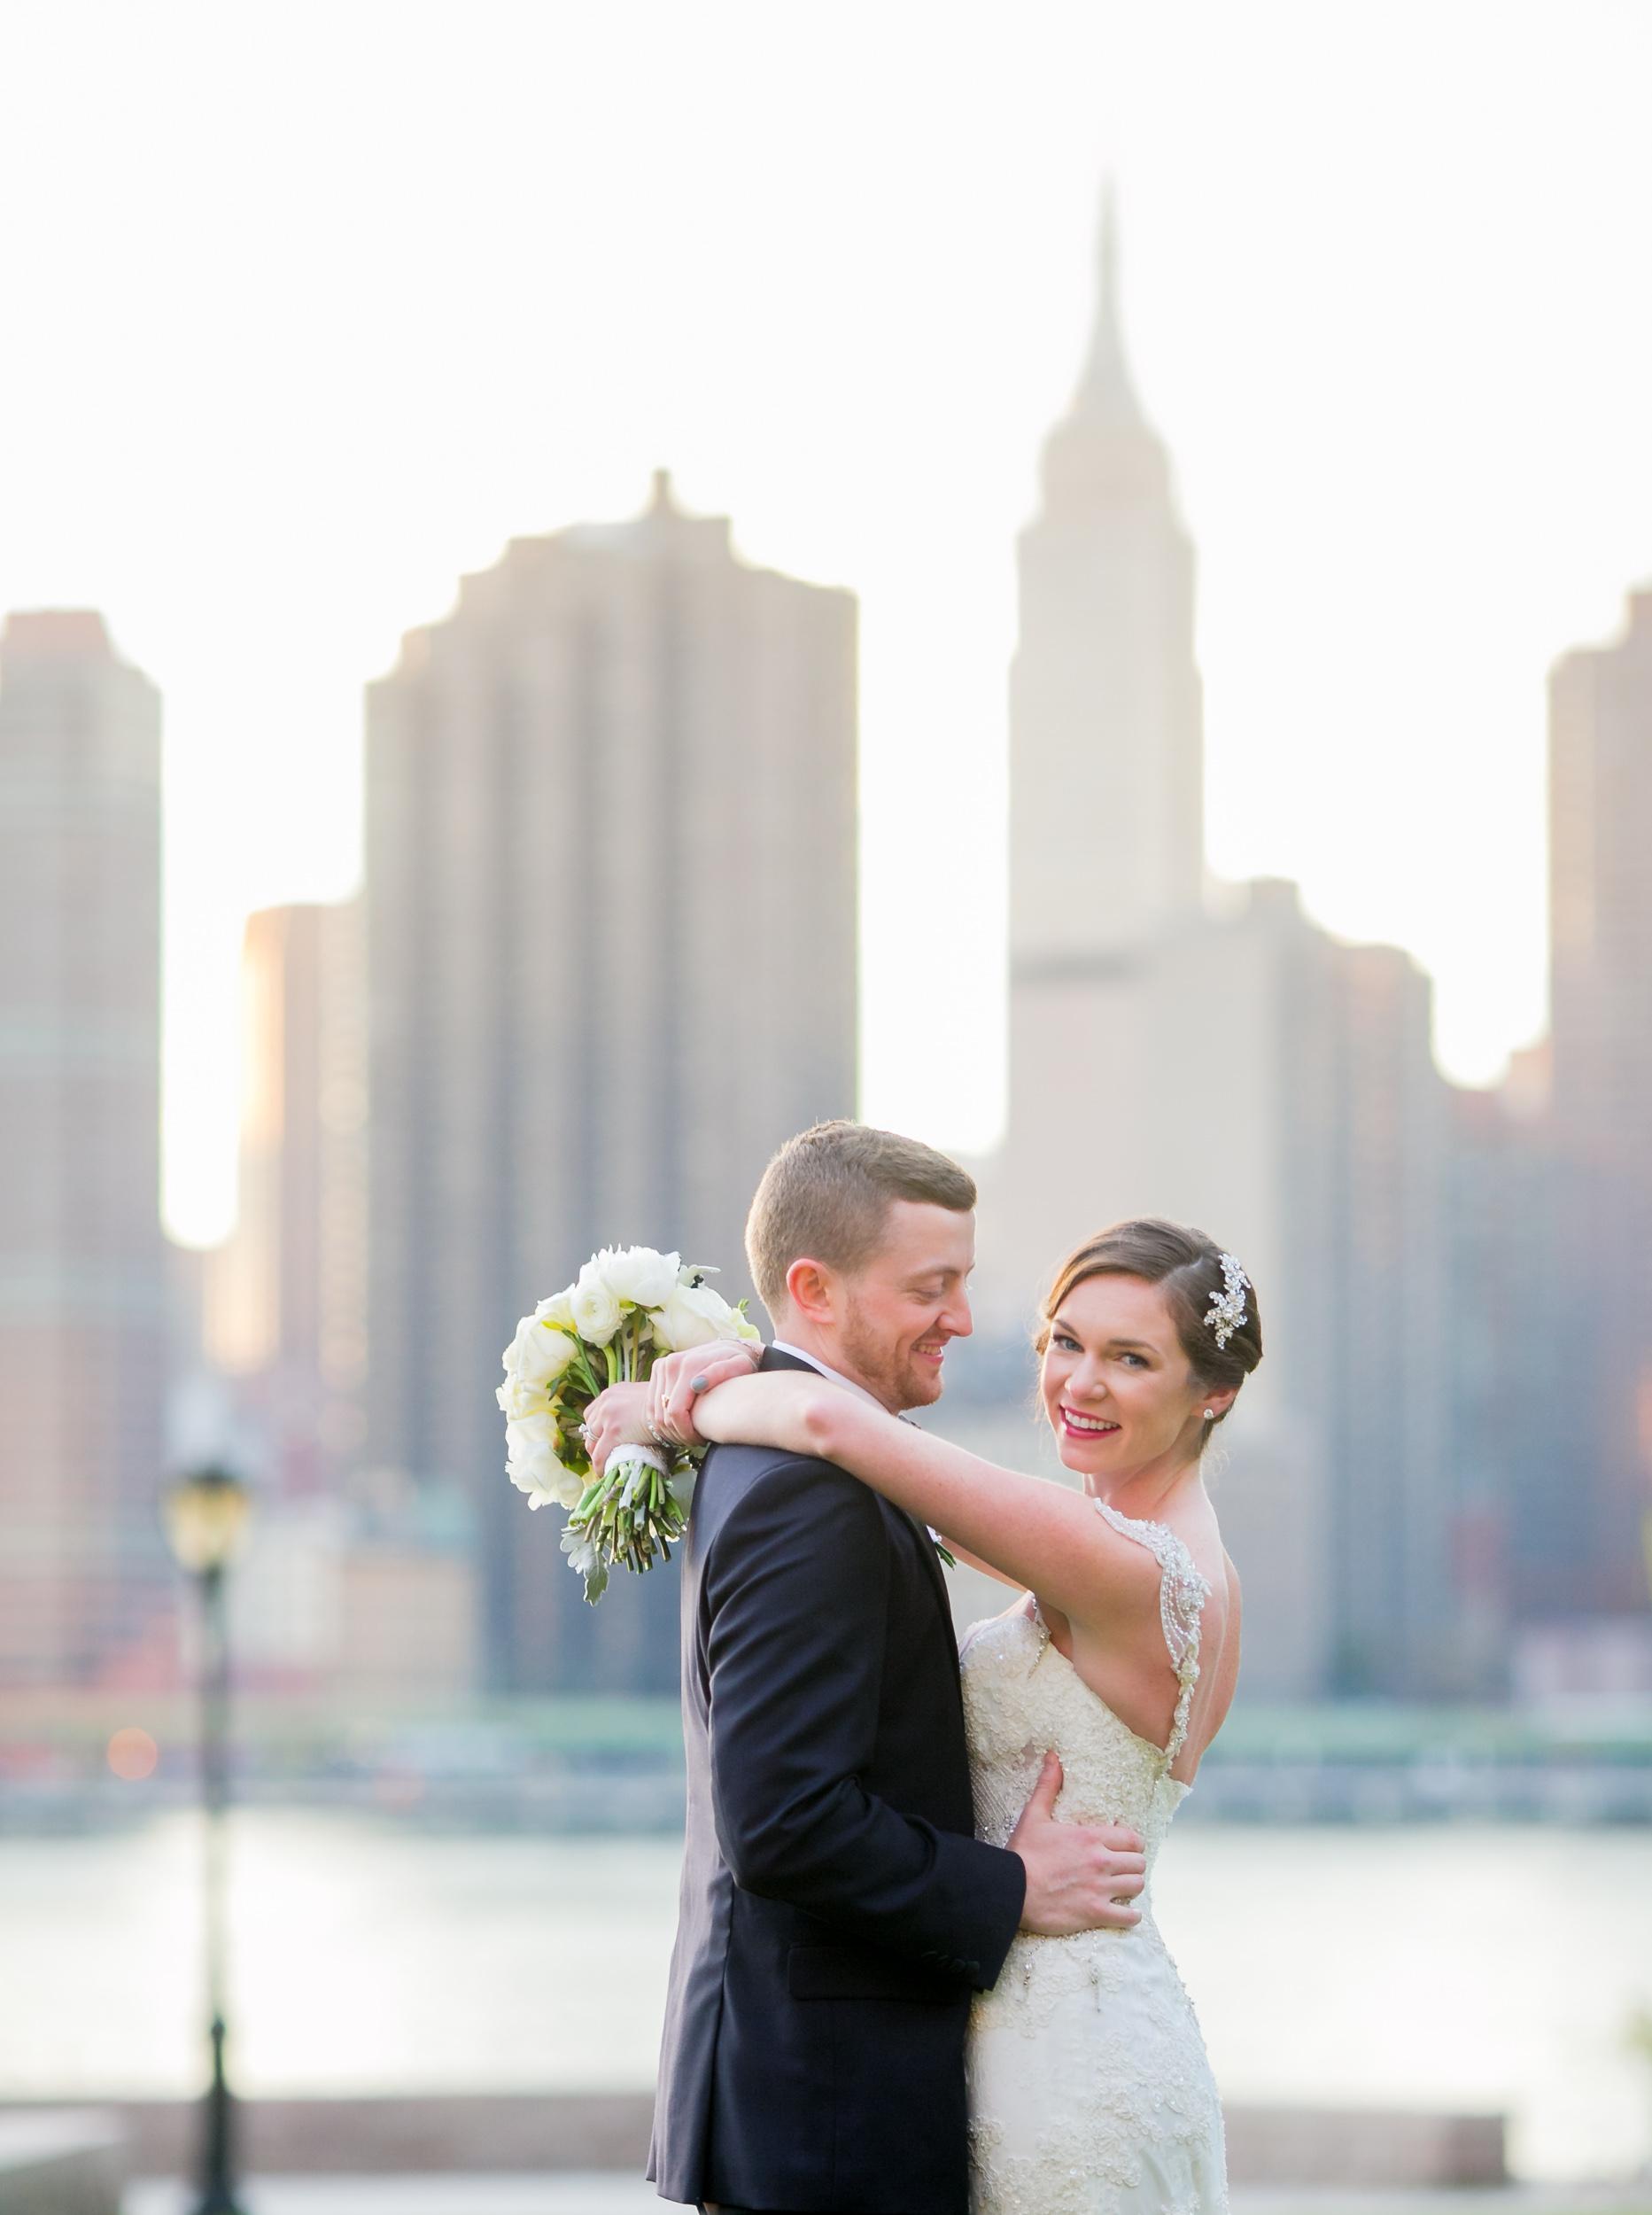 Classic New York Wedding at Guastavinos - Phillip Van Nostrand Photography